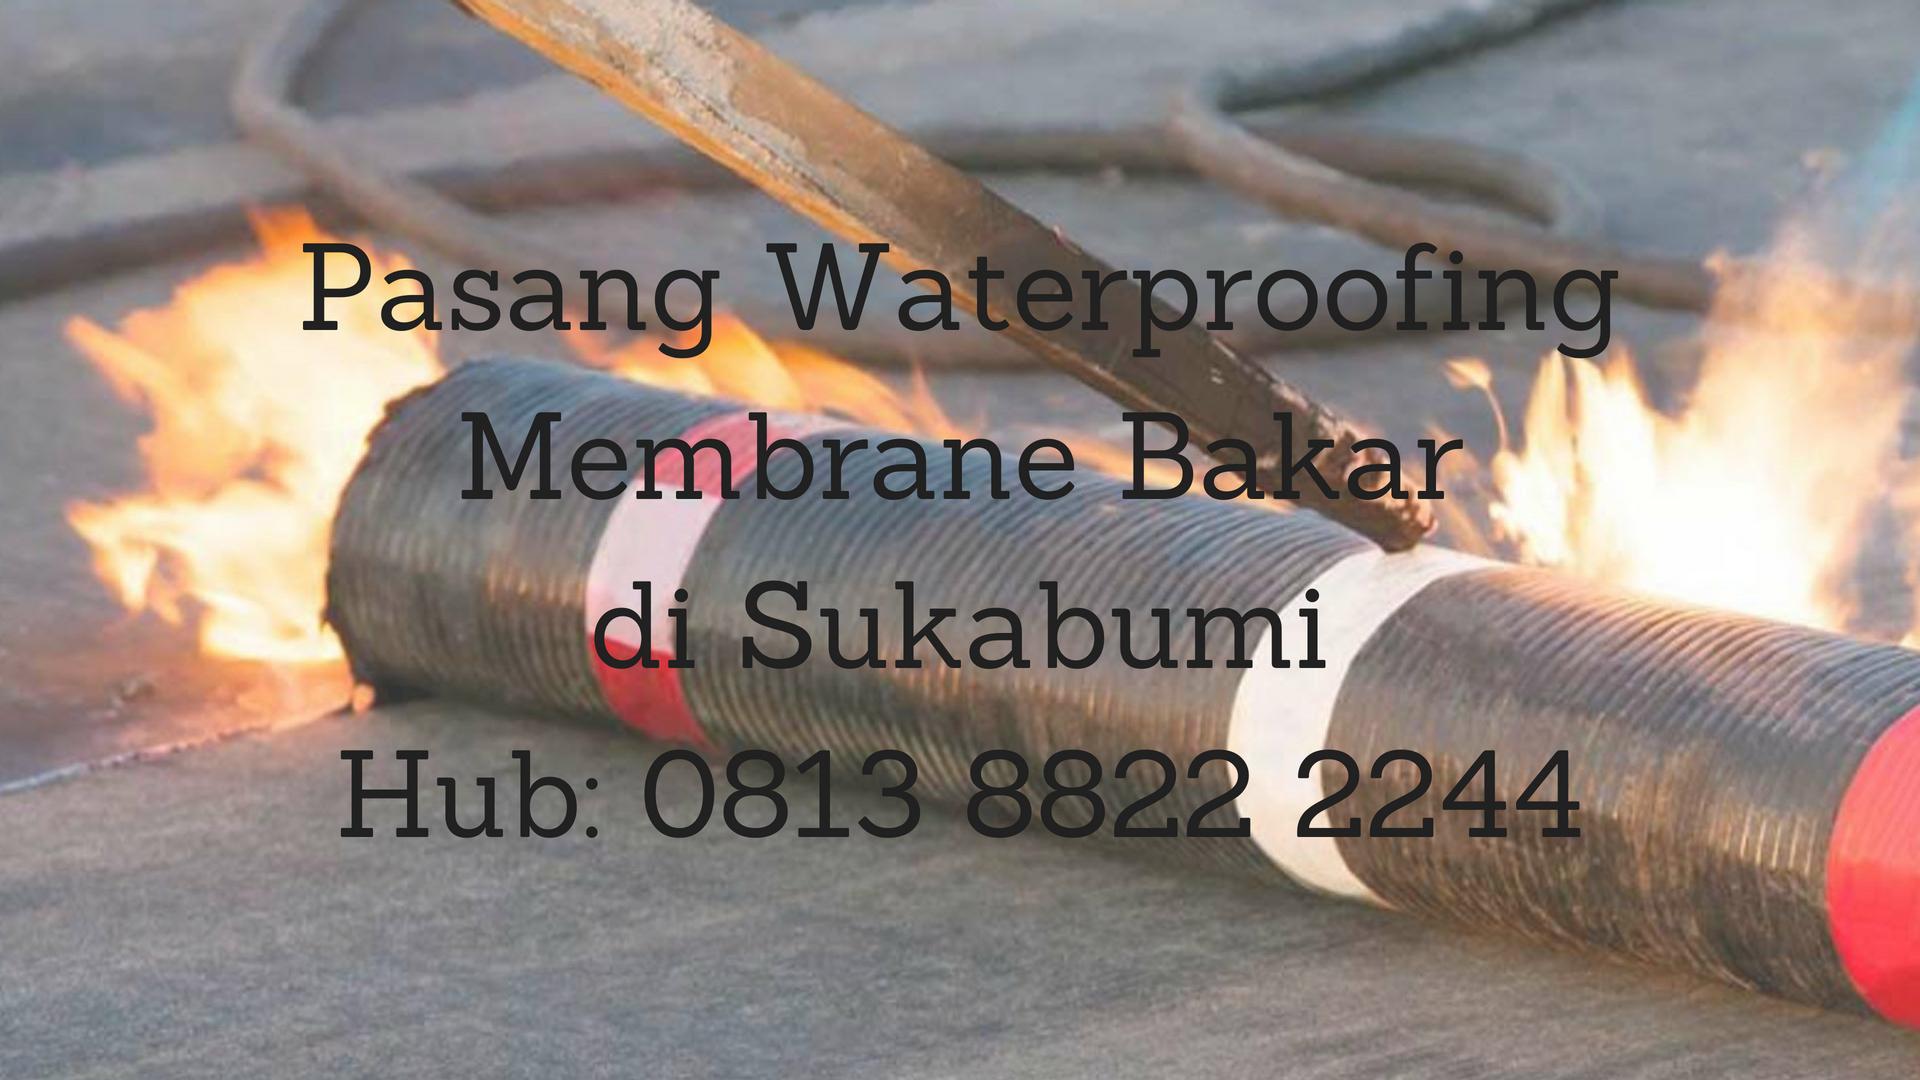 PASANG WATERPROOFING MEMBRANE BAKAR DI SUKABUMI.  HUB : 0813 8822 2244